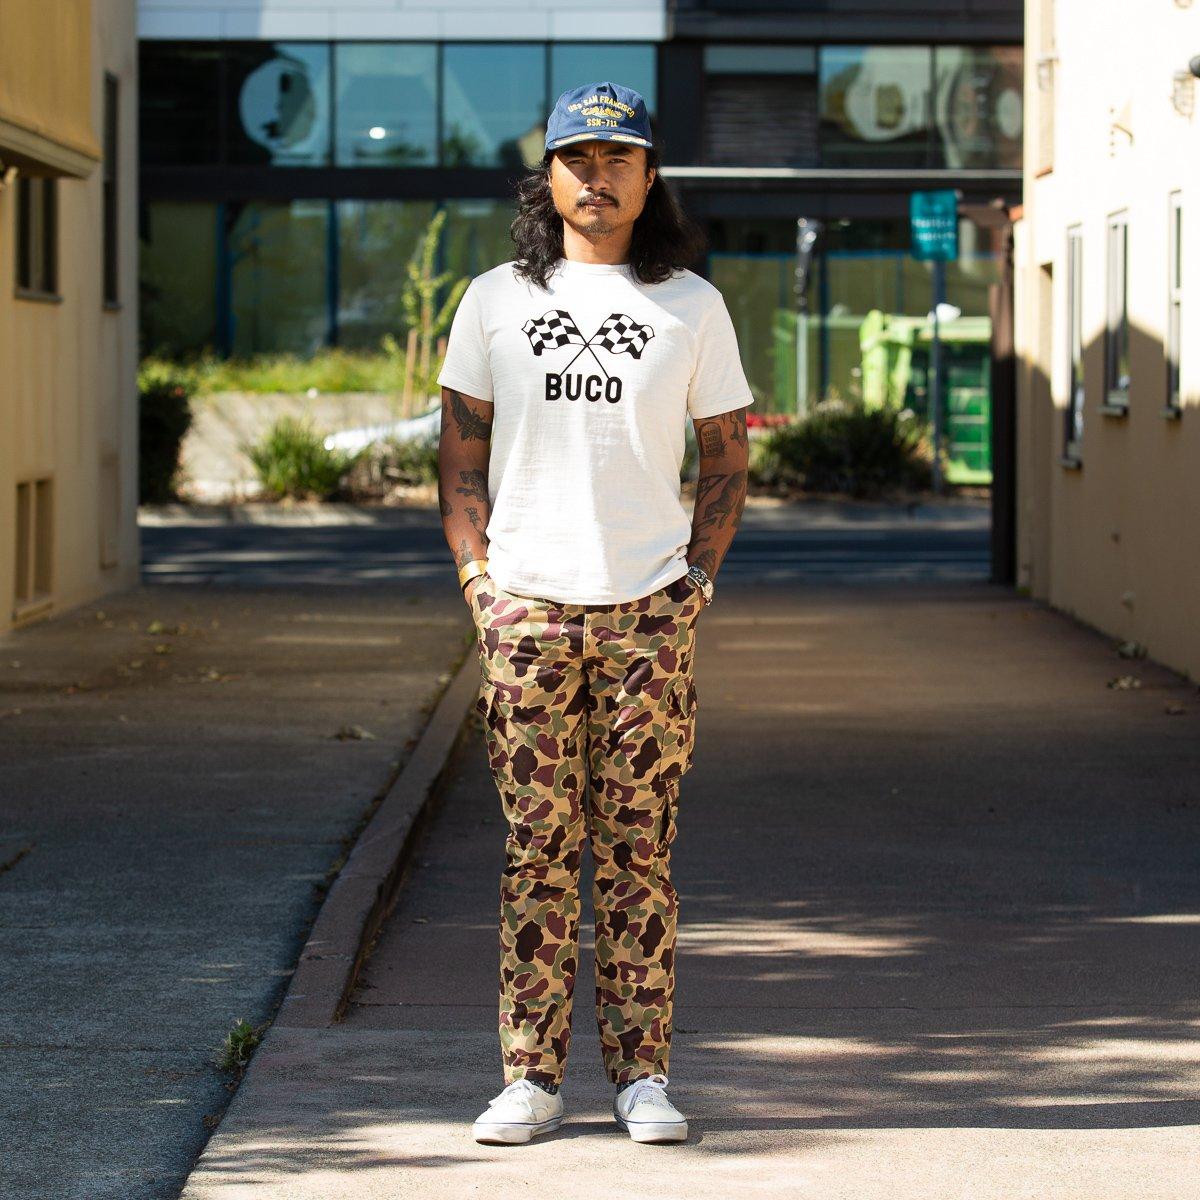 RMC-BeoGamCamouflageTrousers-Onbody-5760x3840-01_2000x.jpeg